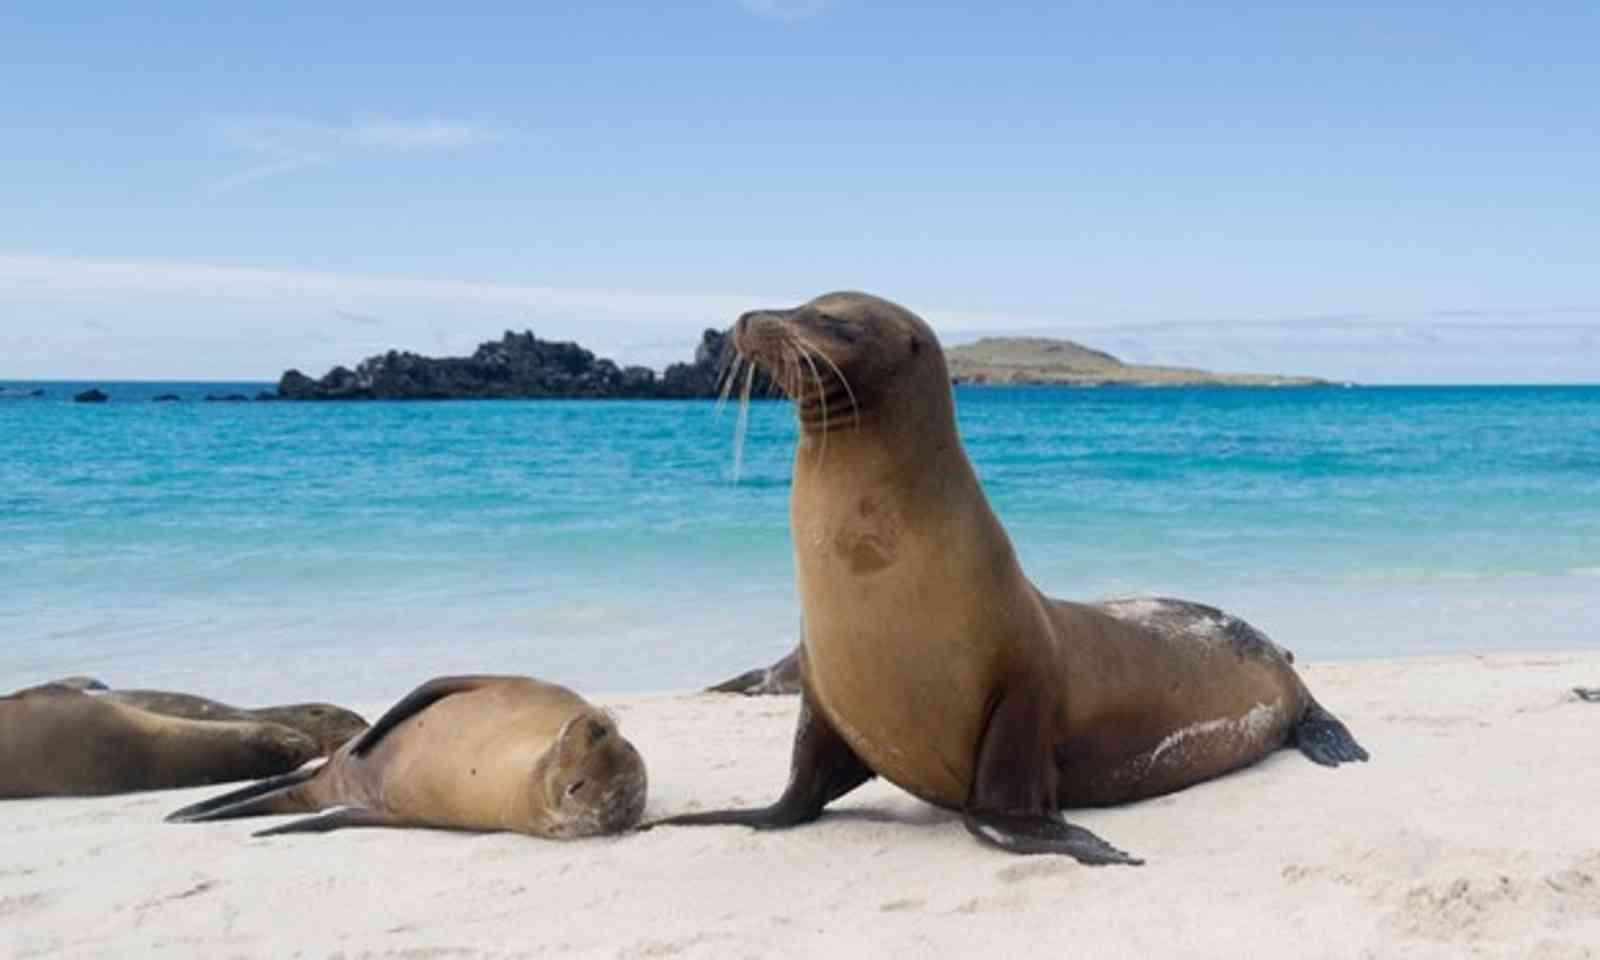 Galapagos Sea Lion (Shutterstock.com)